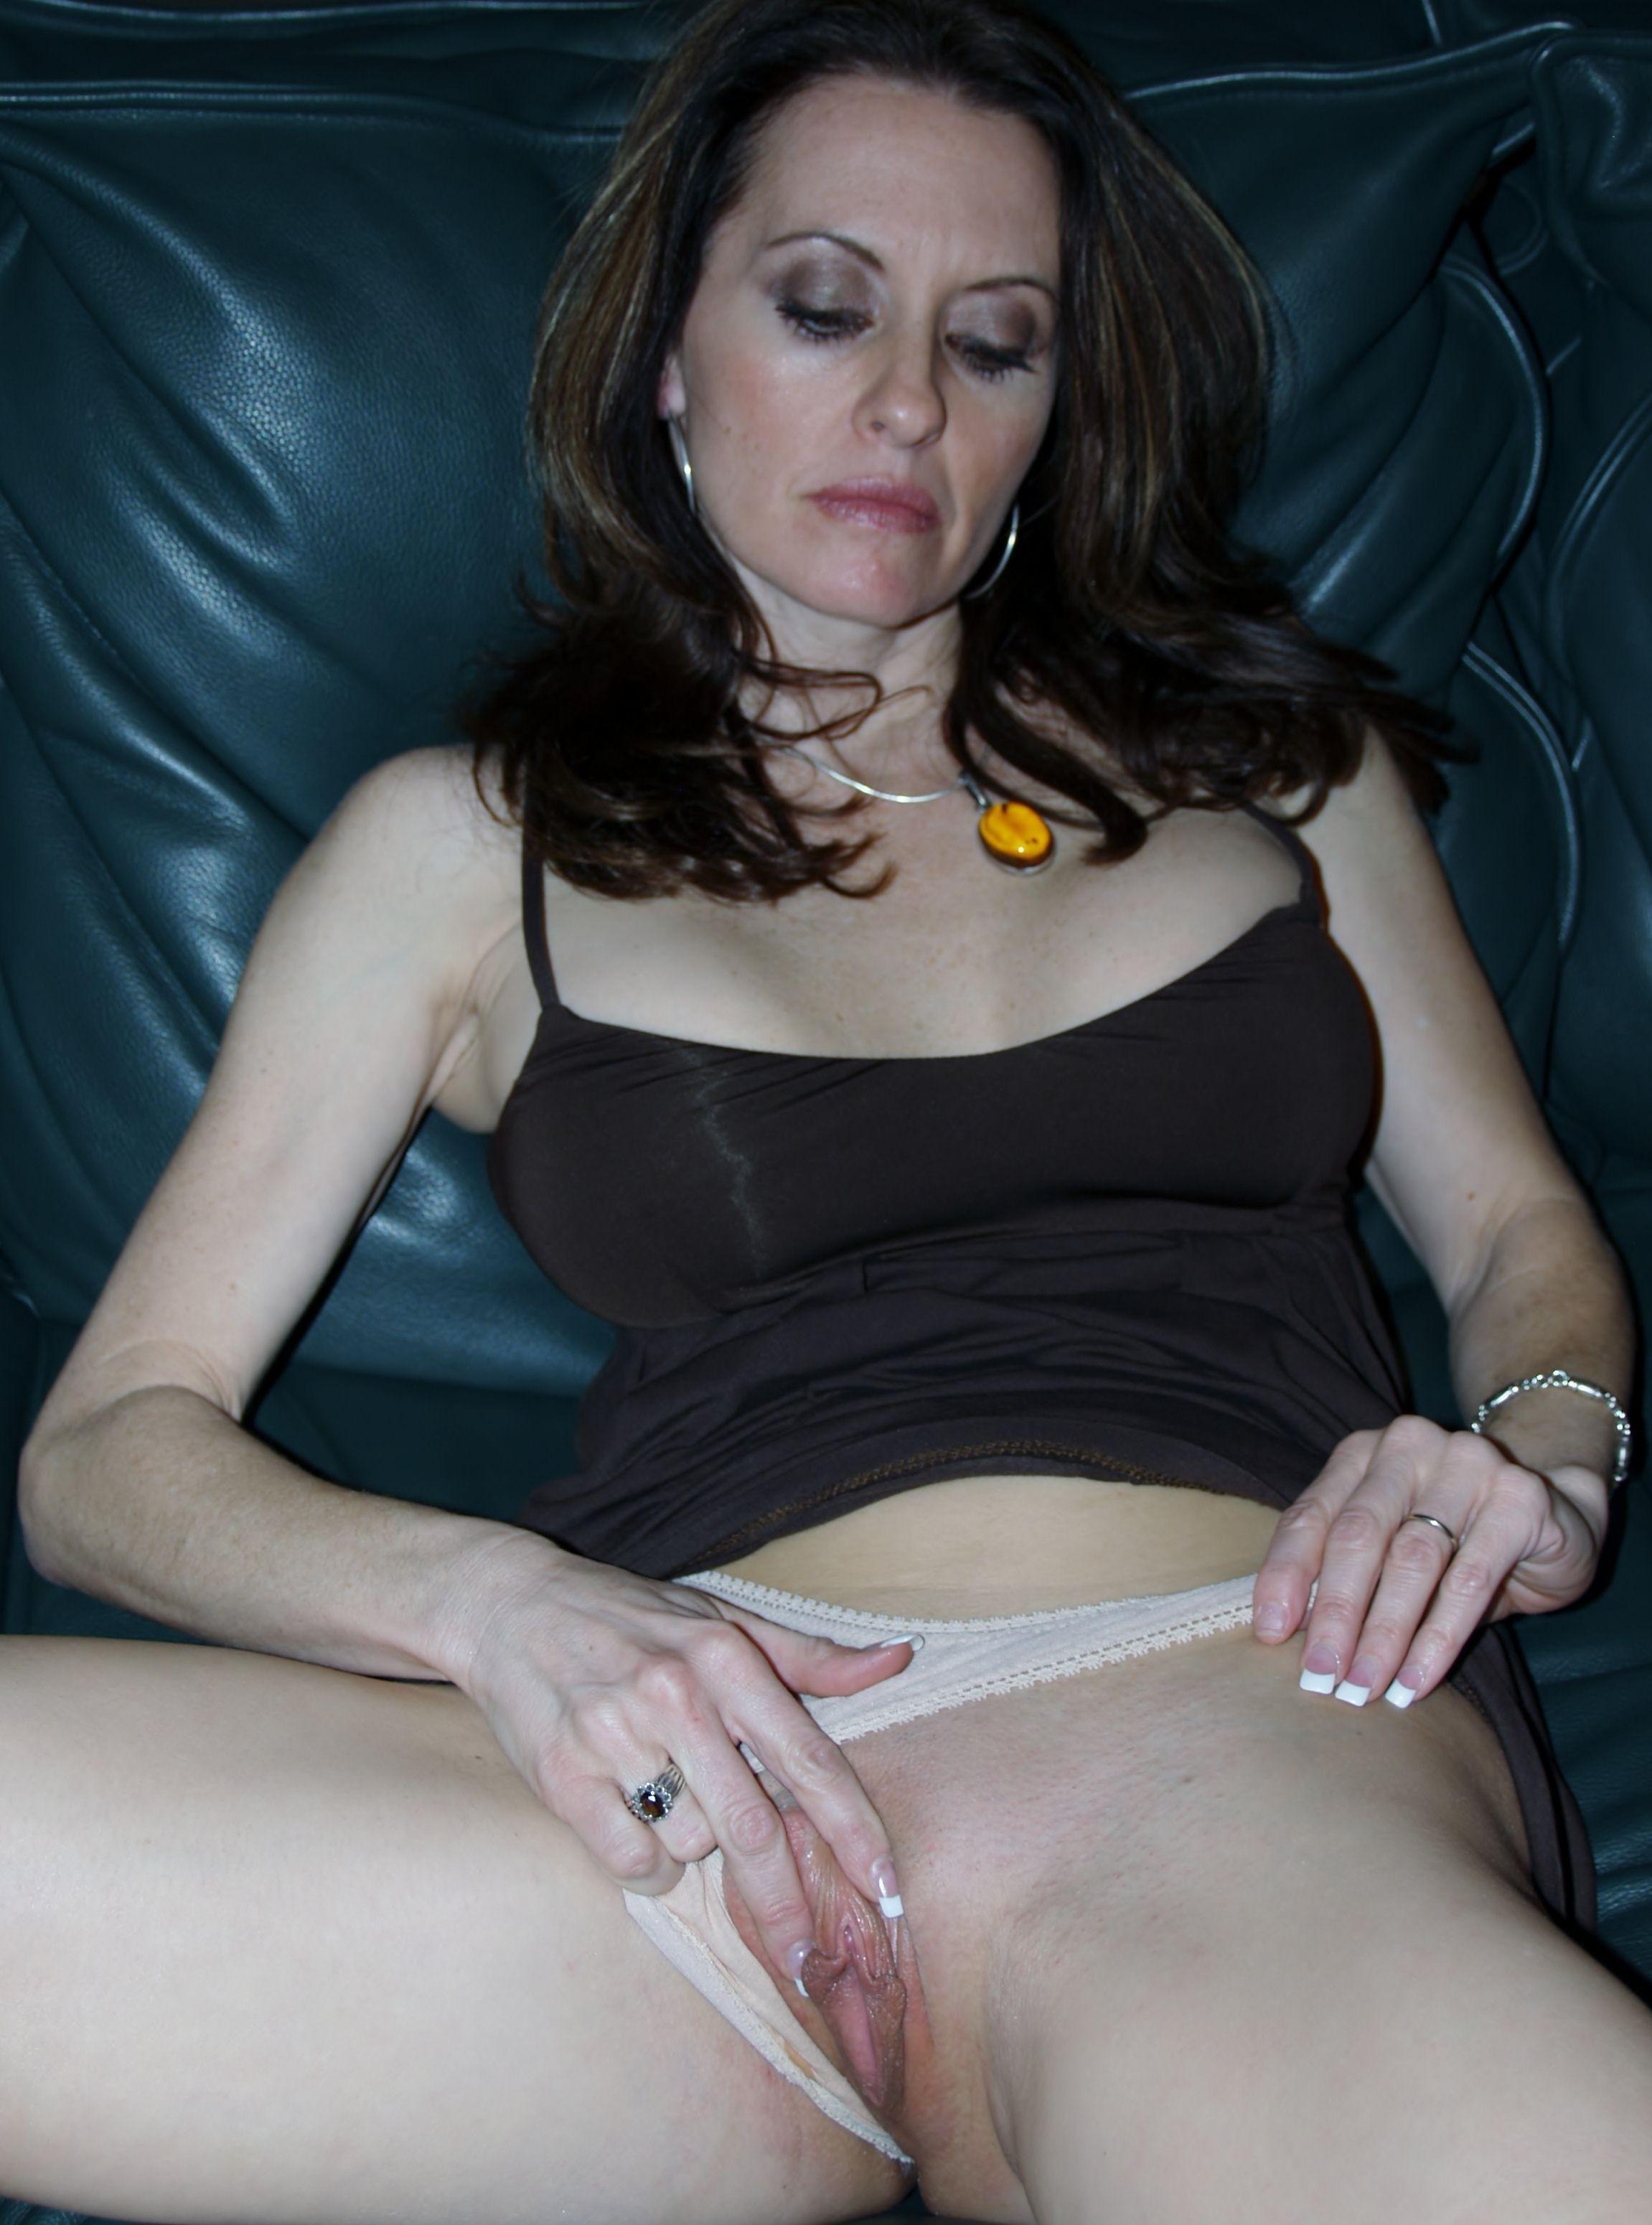 Teen porn video thumbs